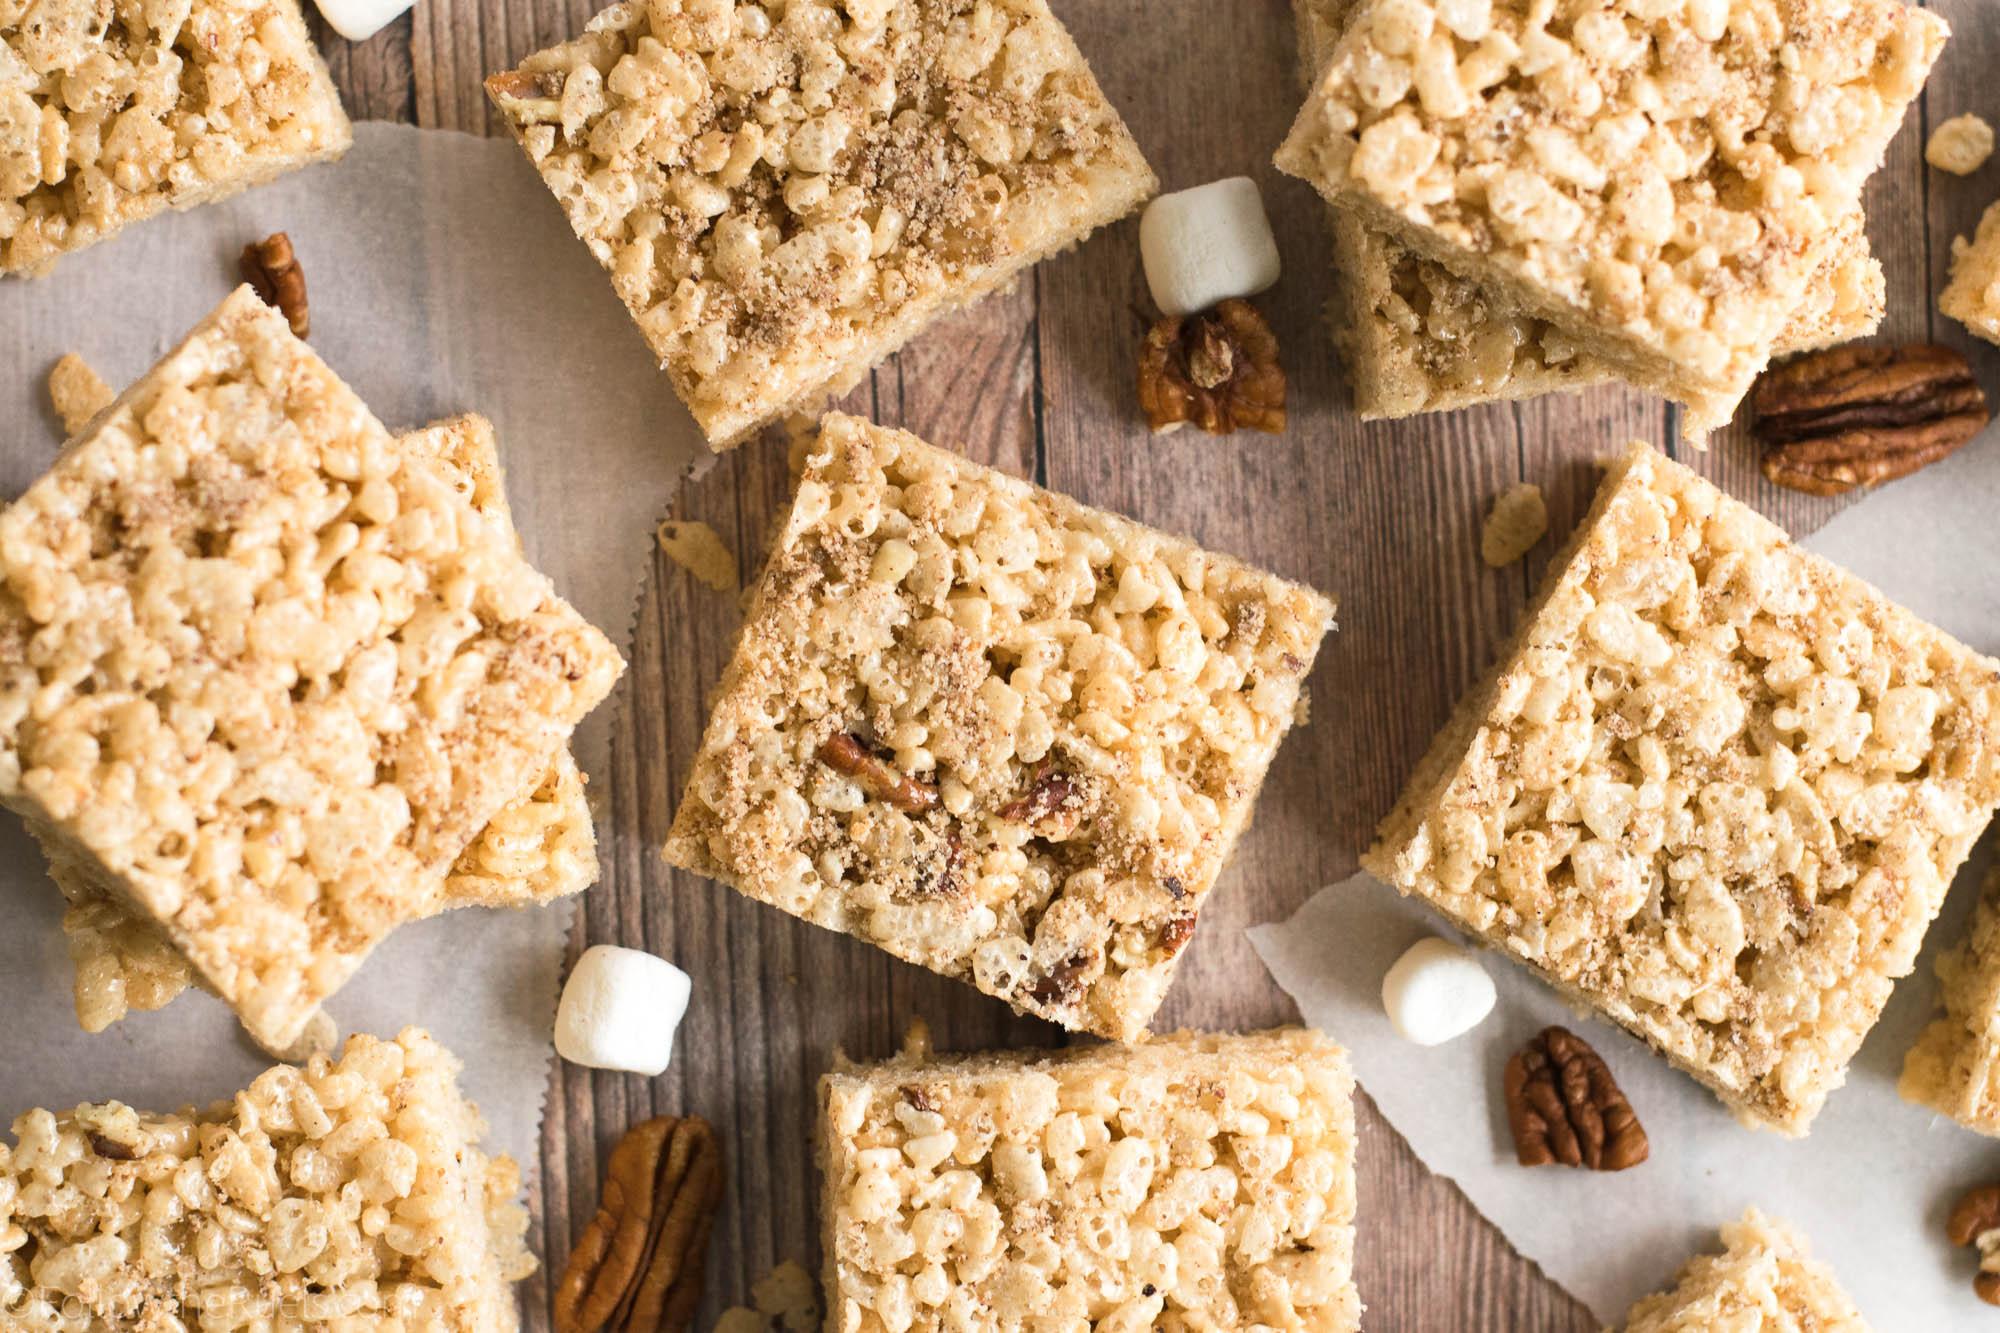 Maple-Pecan-Rice-Krispie-Treats-16.jpg